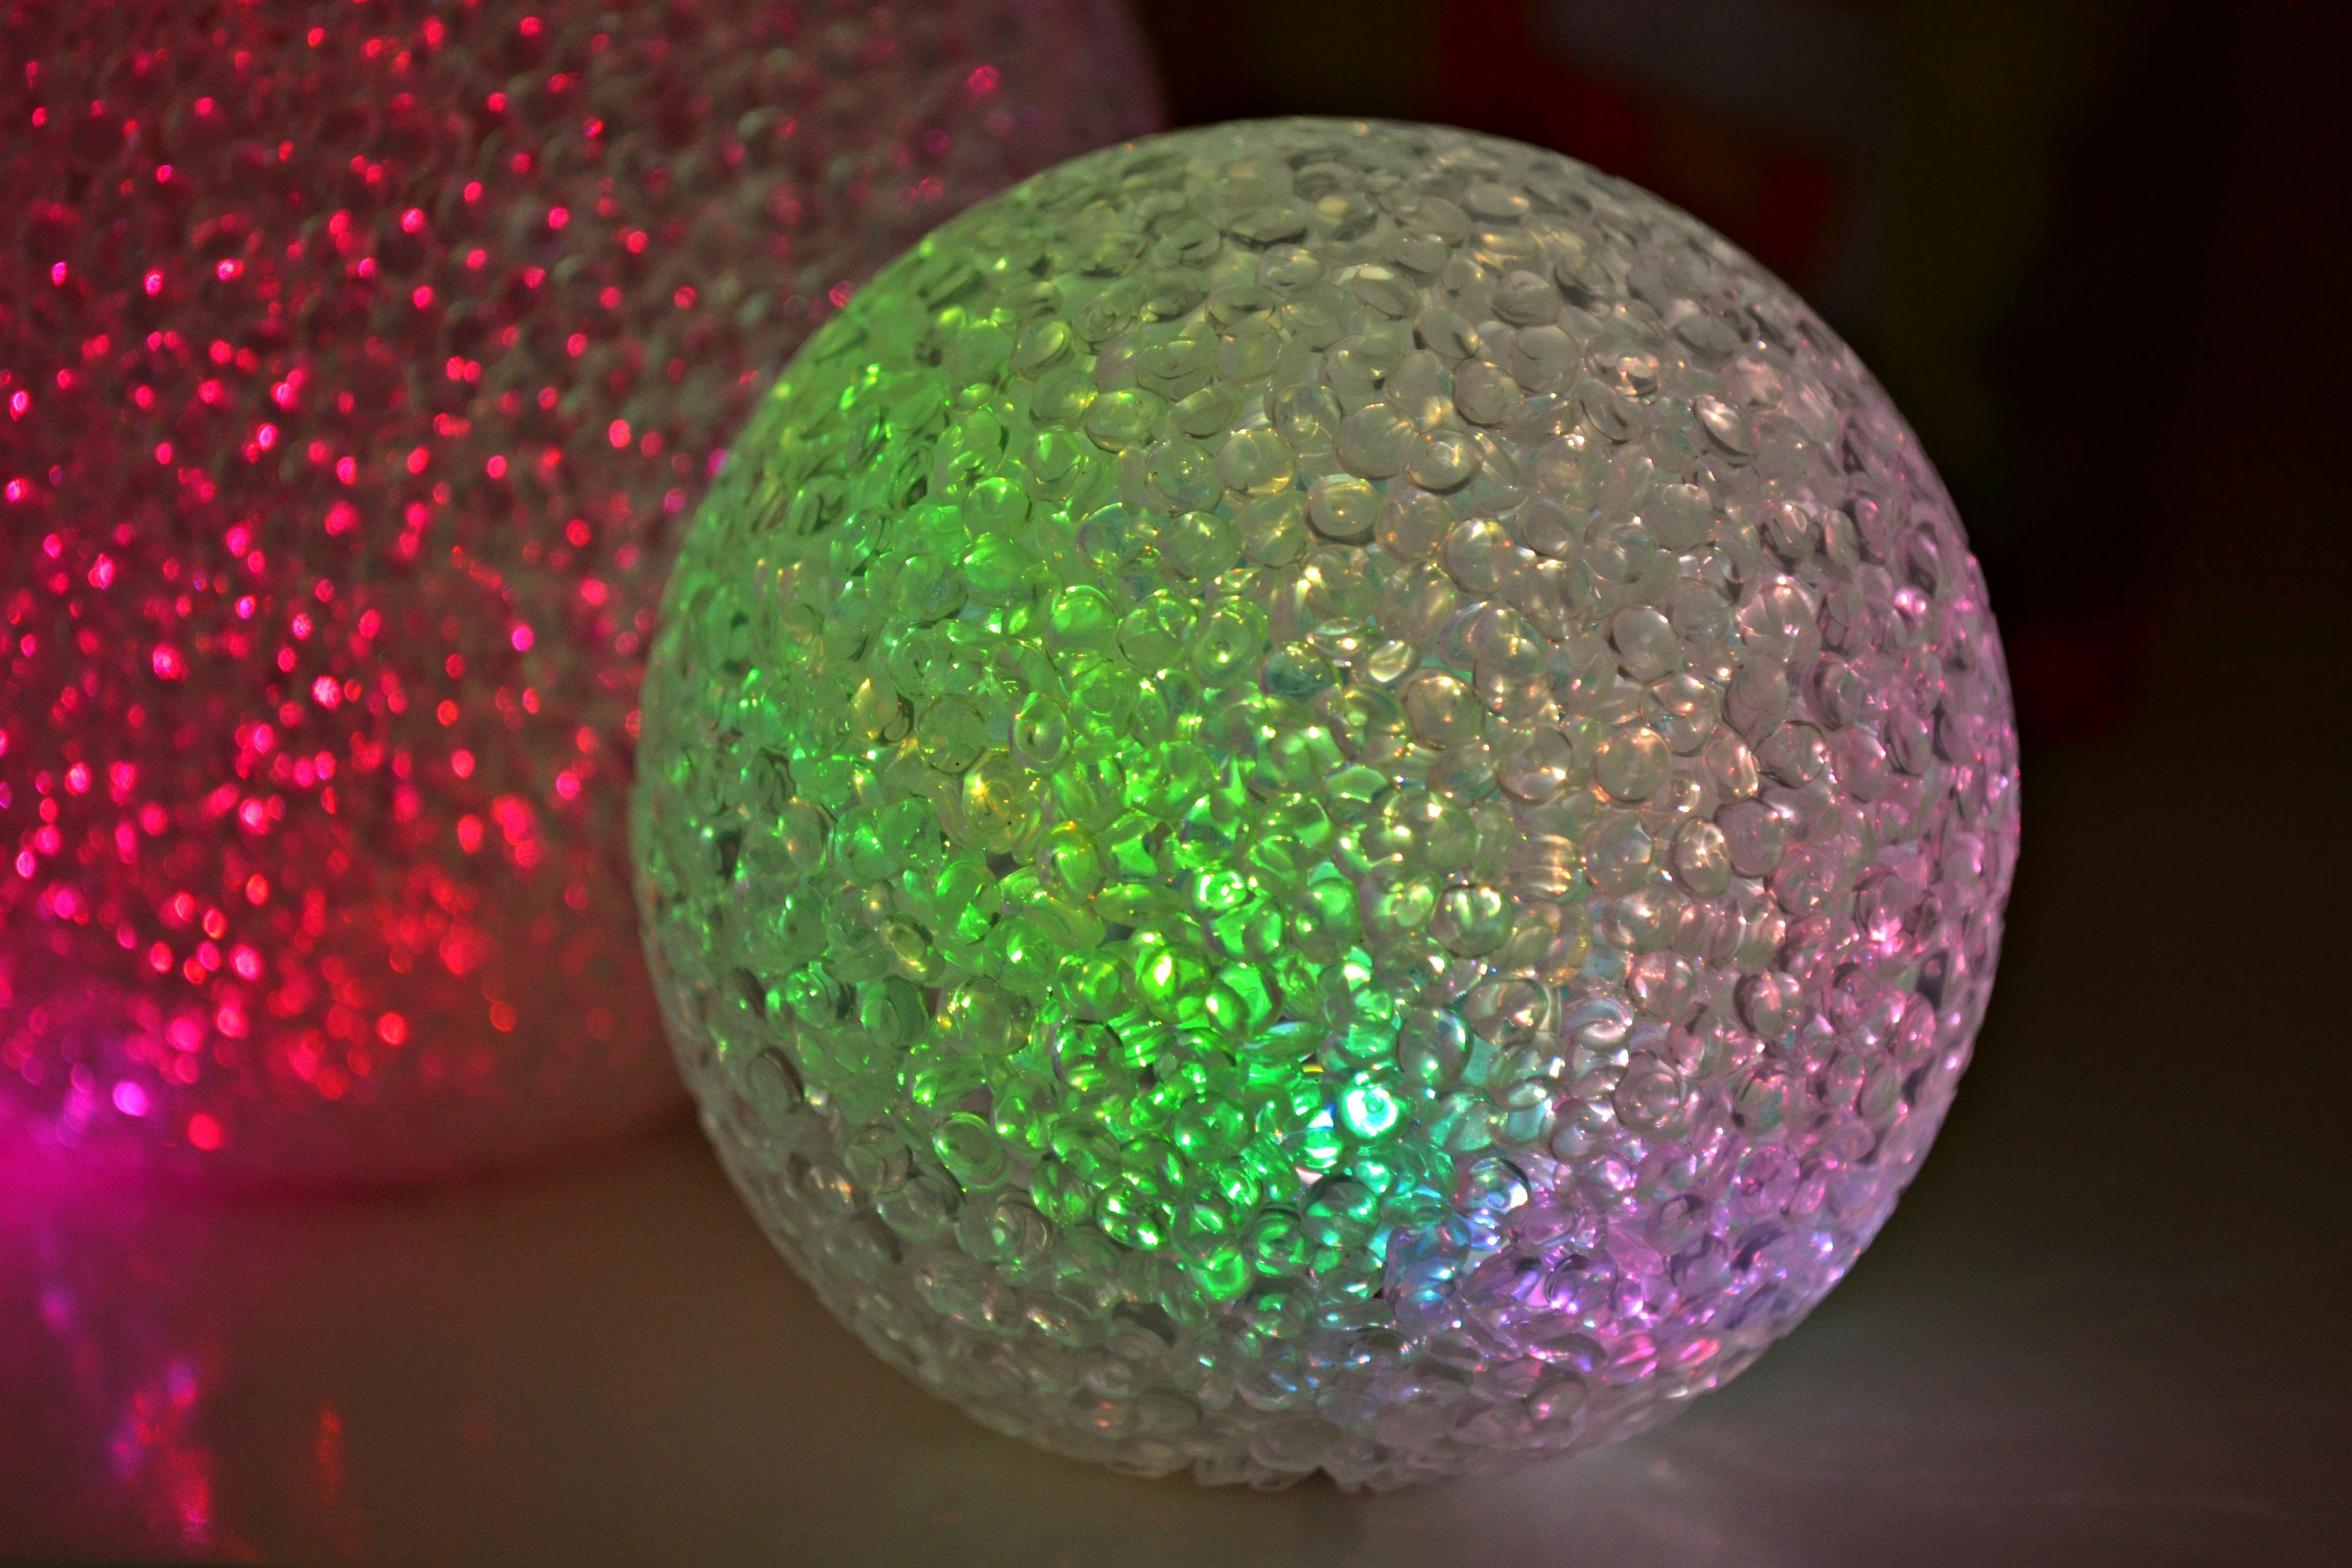 Philips Weihnachtsbeleuchtung.Outdoor Beleuchtete Weihnachts Glühbirnen Led Ball Christmas Tree